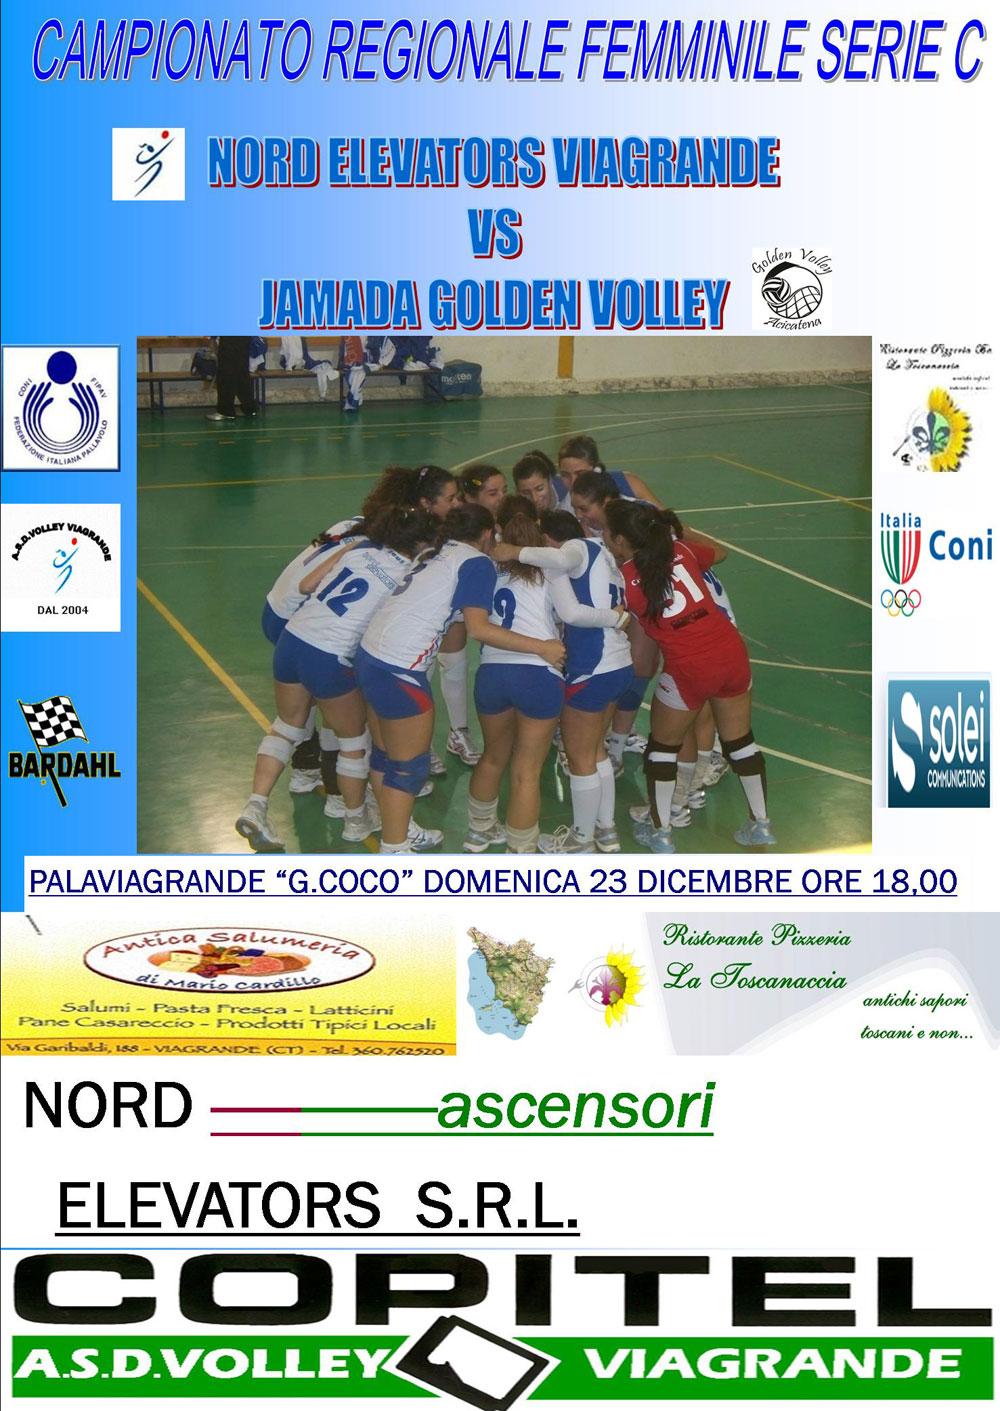 Nord Elevator Viagrande - Jamada Golden Volley